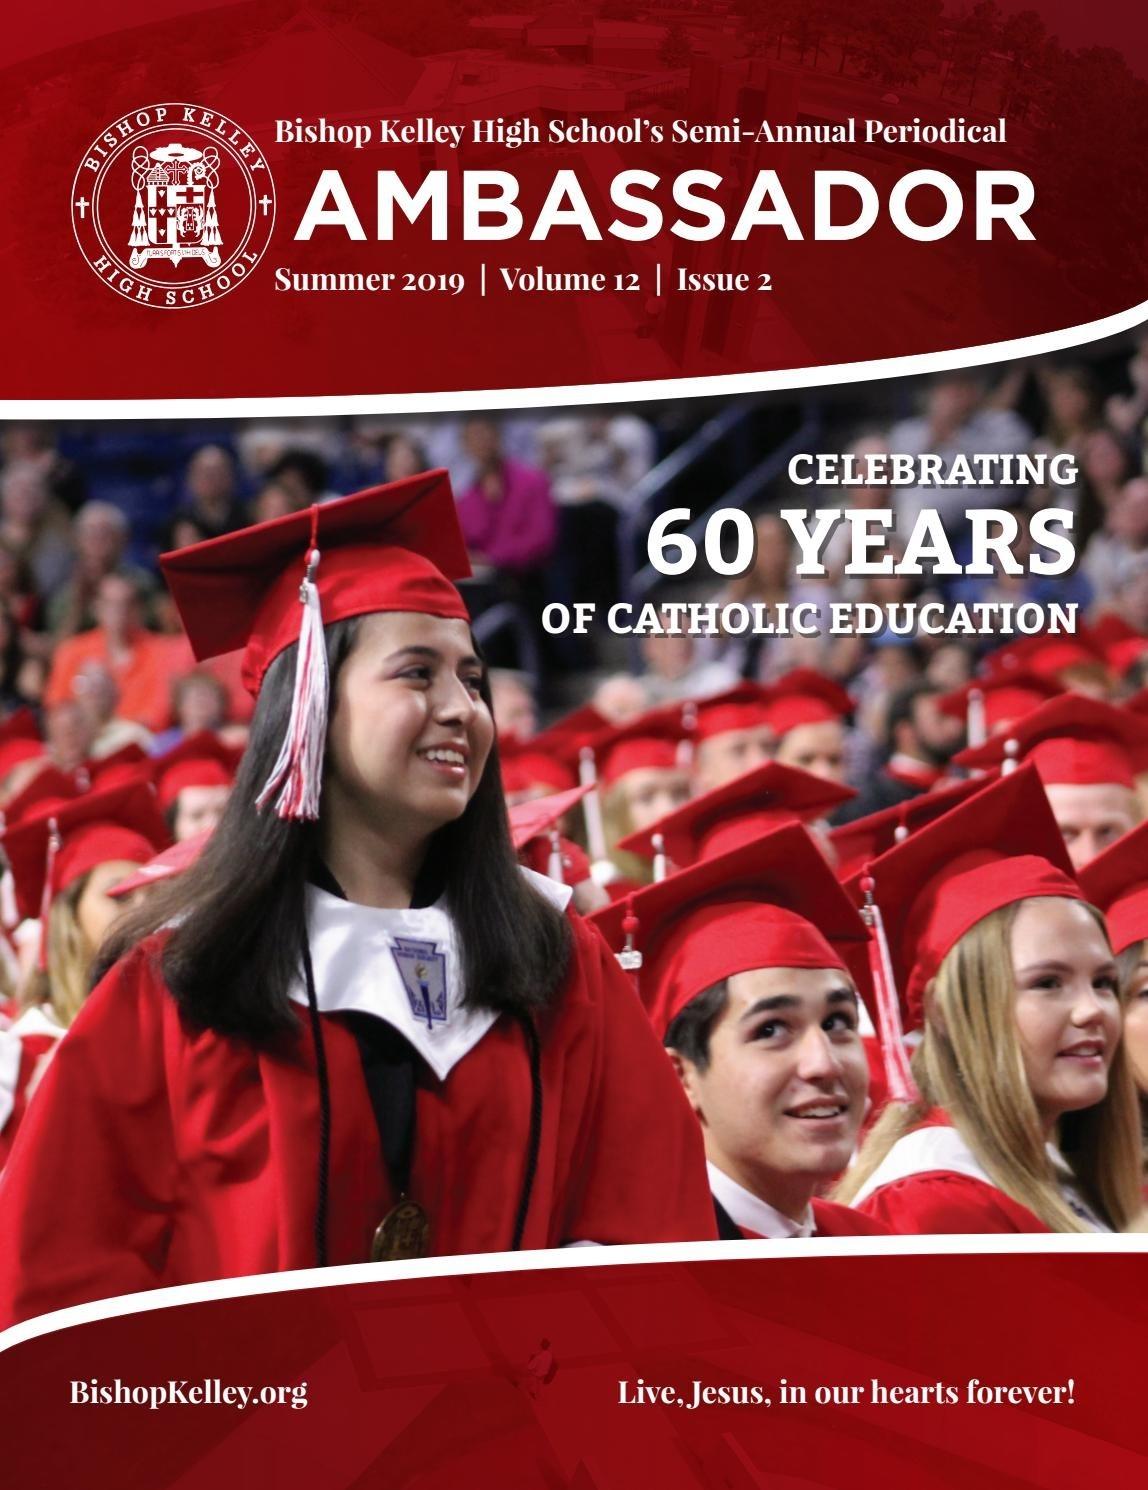 Bishop Kelley Ambassador - Summer 2019 By Lhillenberg - Issuu-Bishop Kelley 2020 Holidays